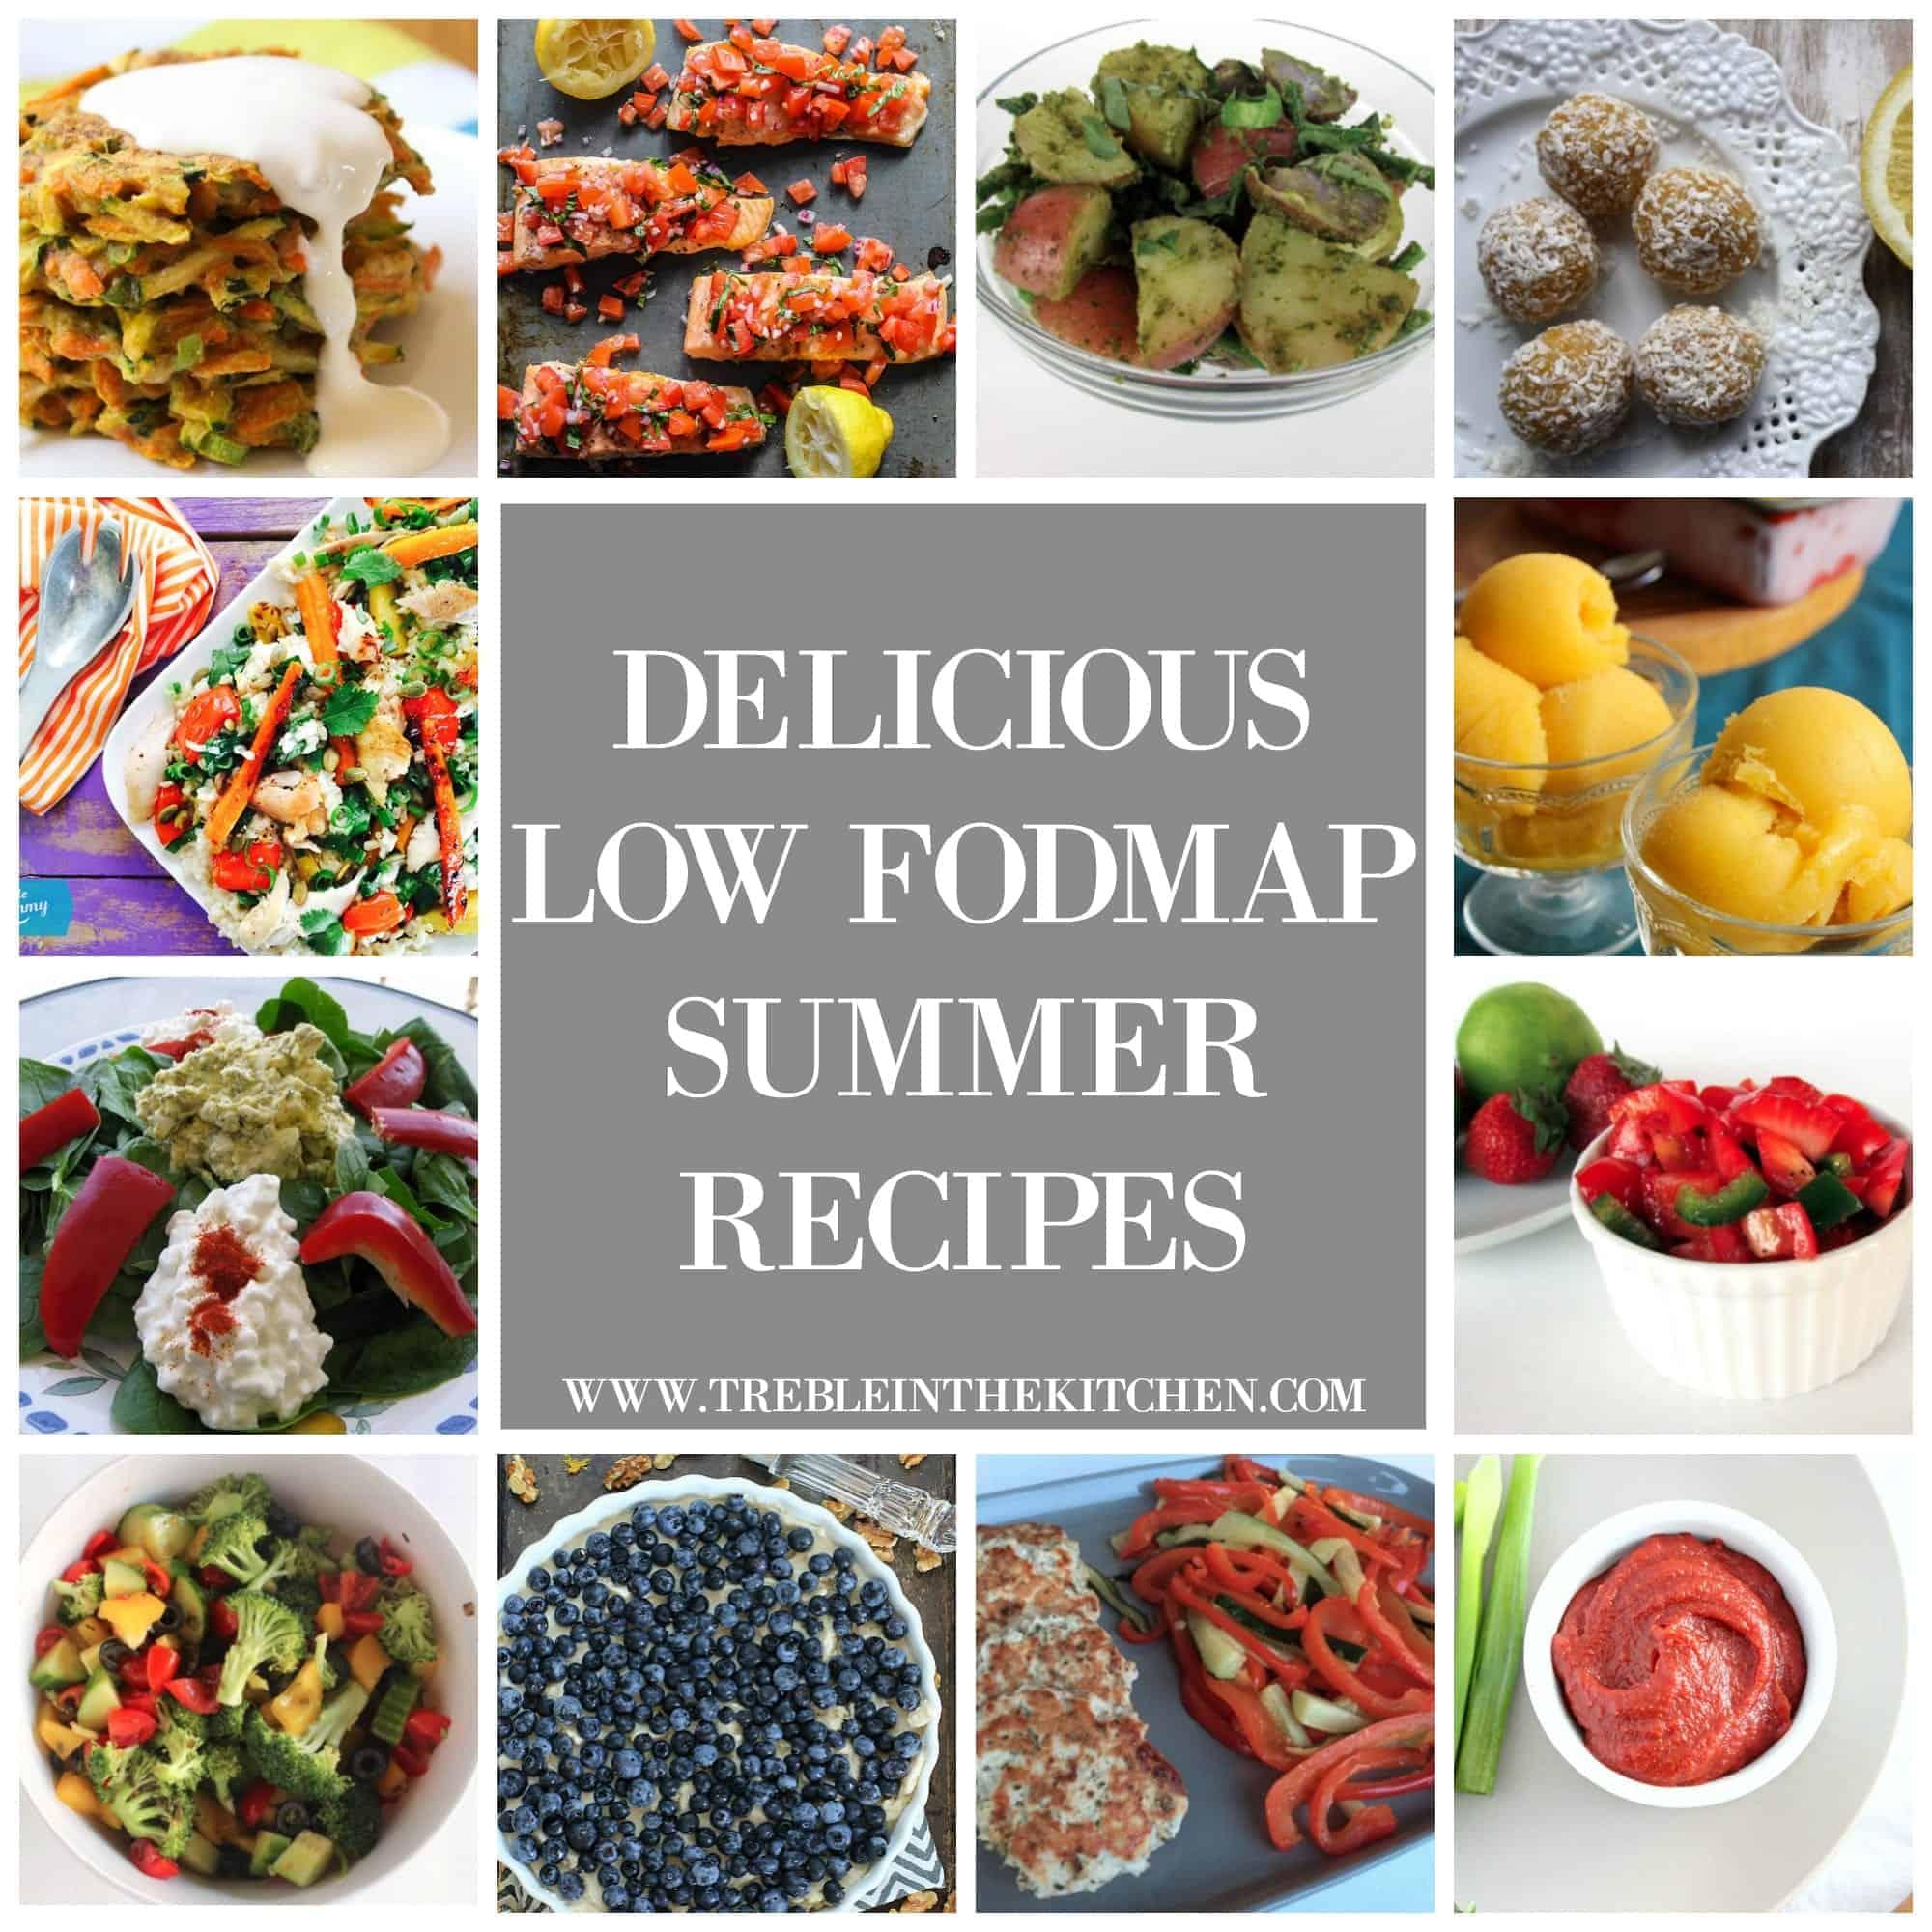 Delicious Low FODMAP Summer Recipes